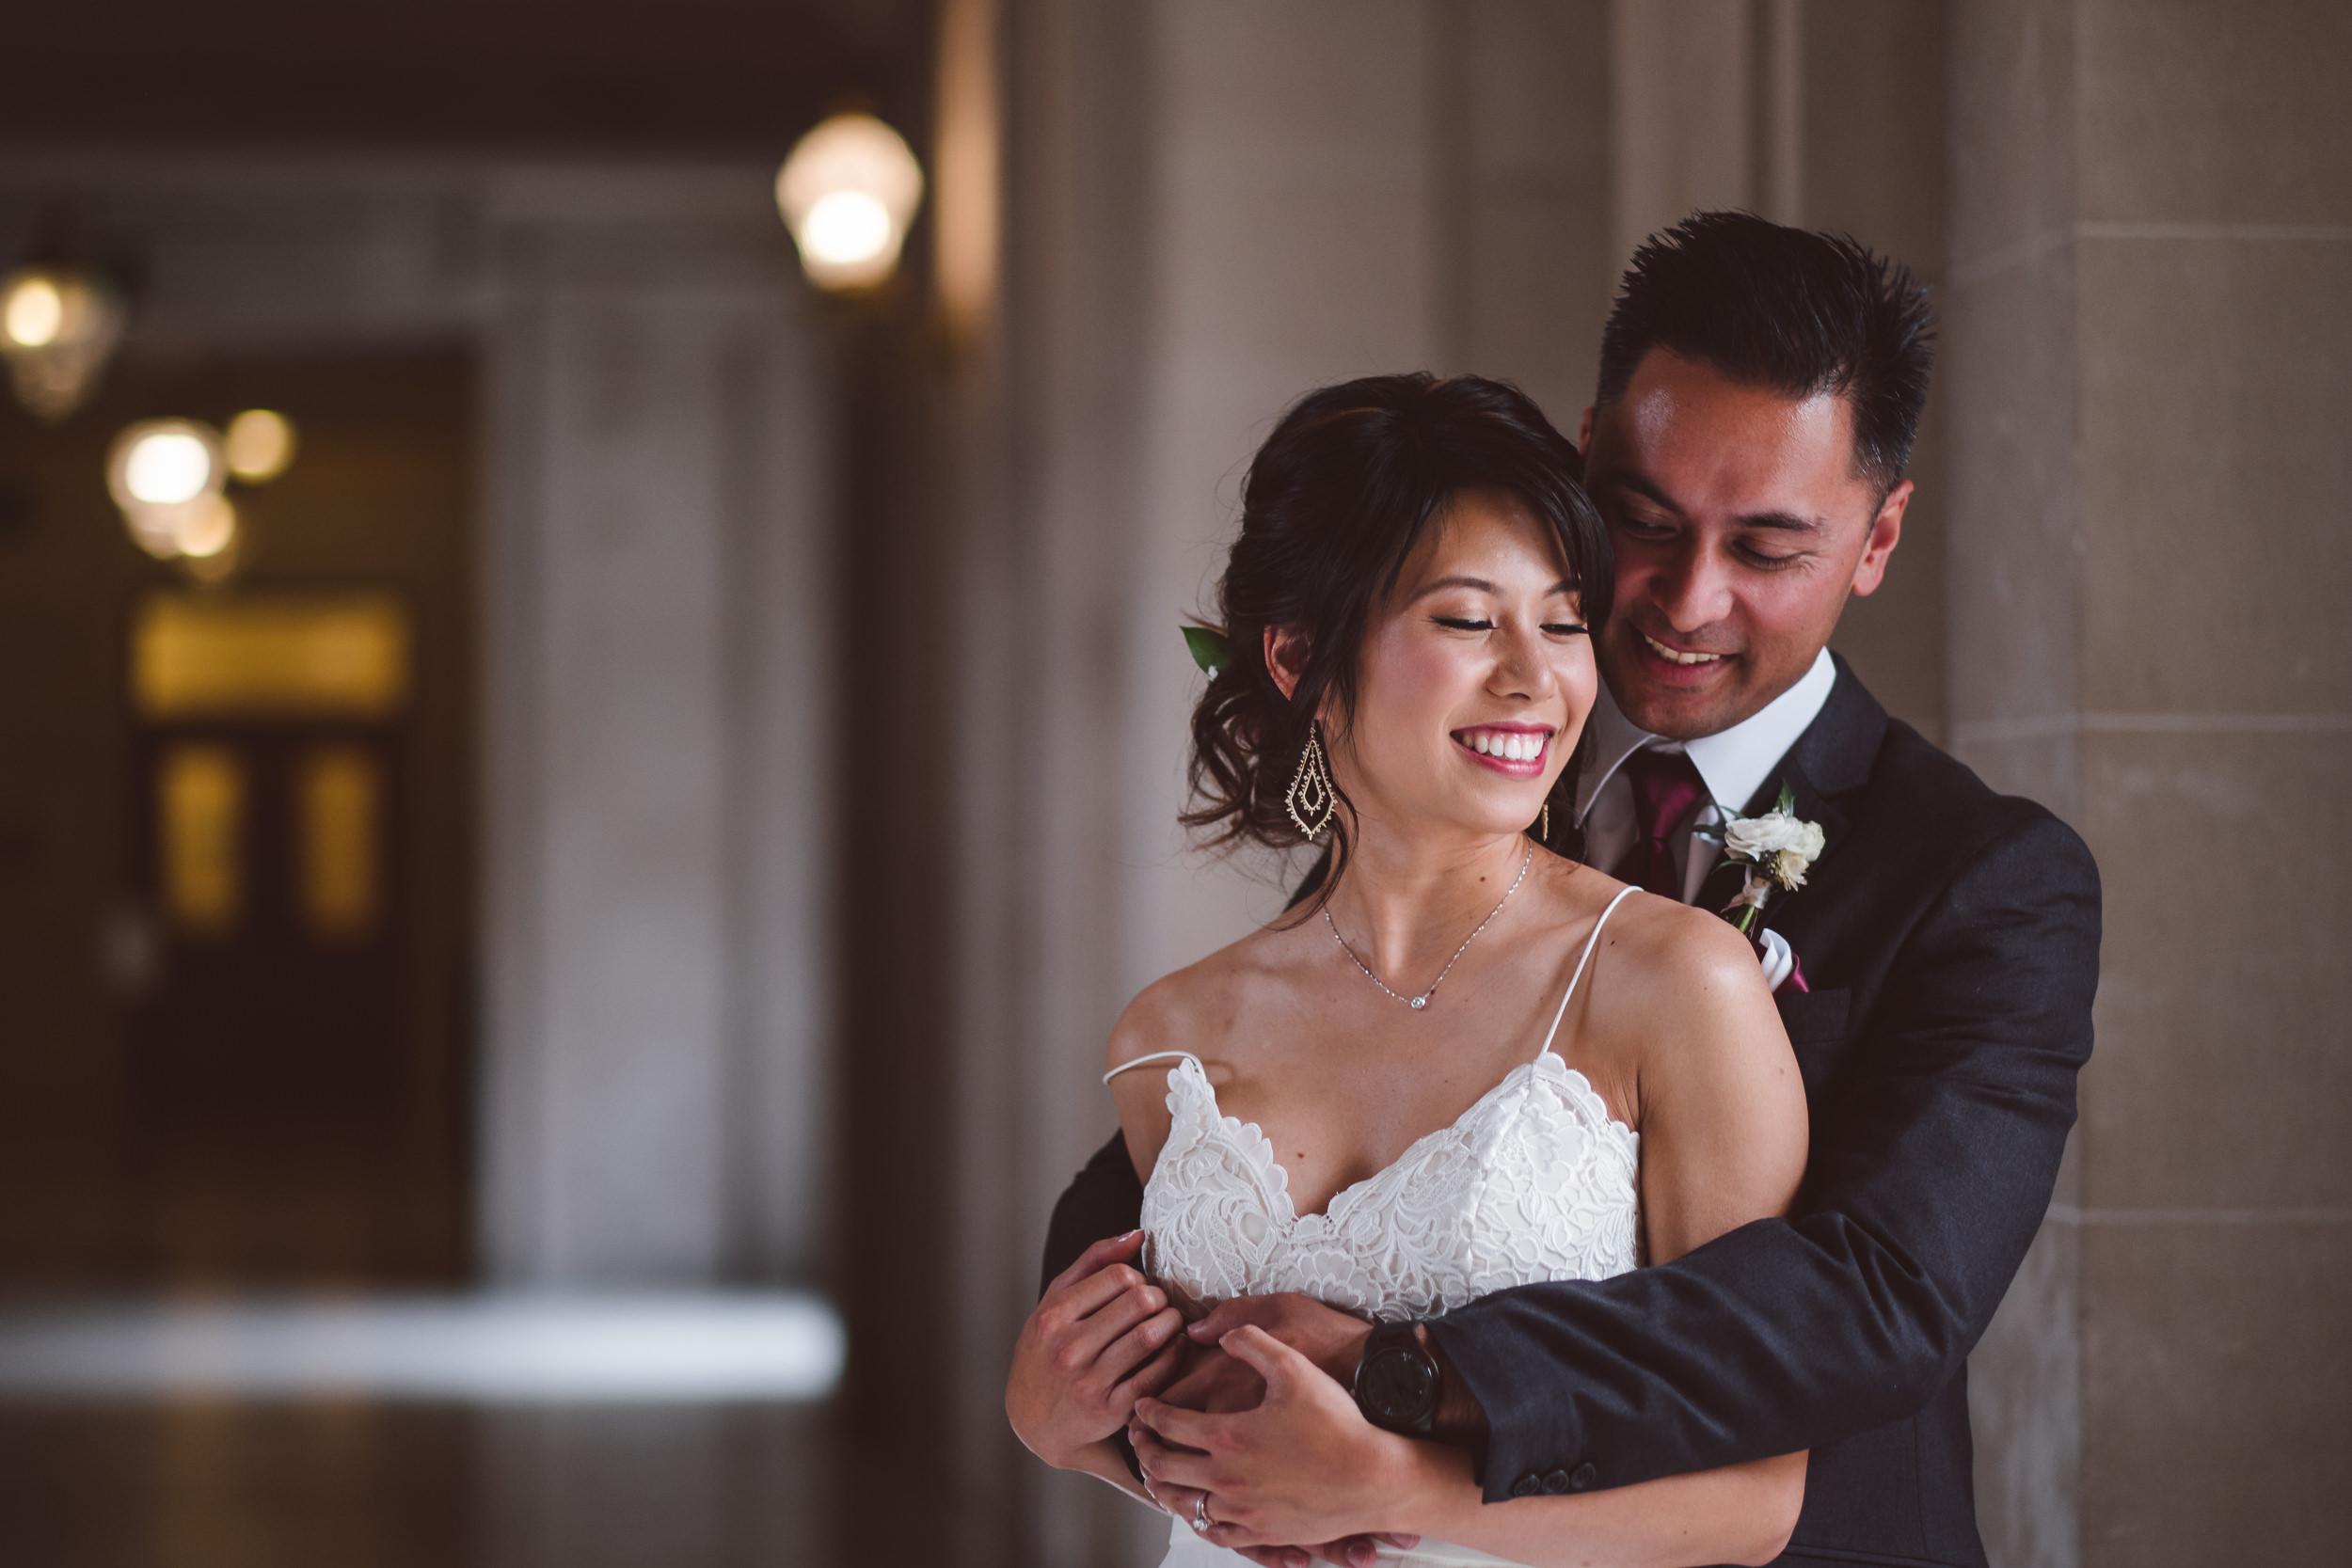 San-Francisco-City-Hall-Wedding-Photography-064.jpg